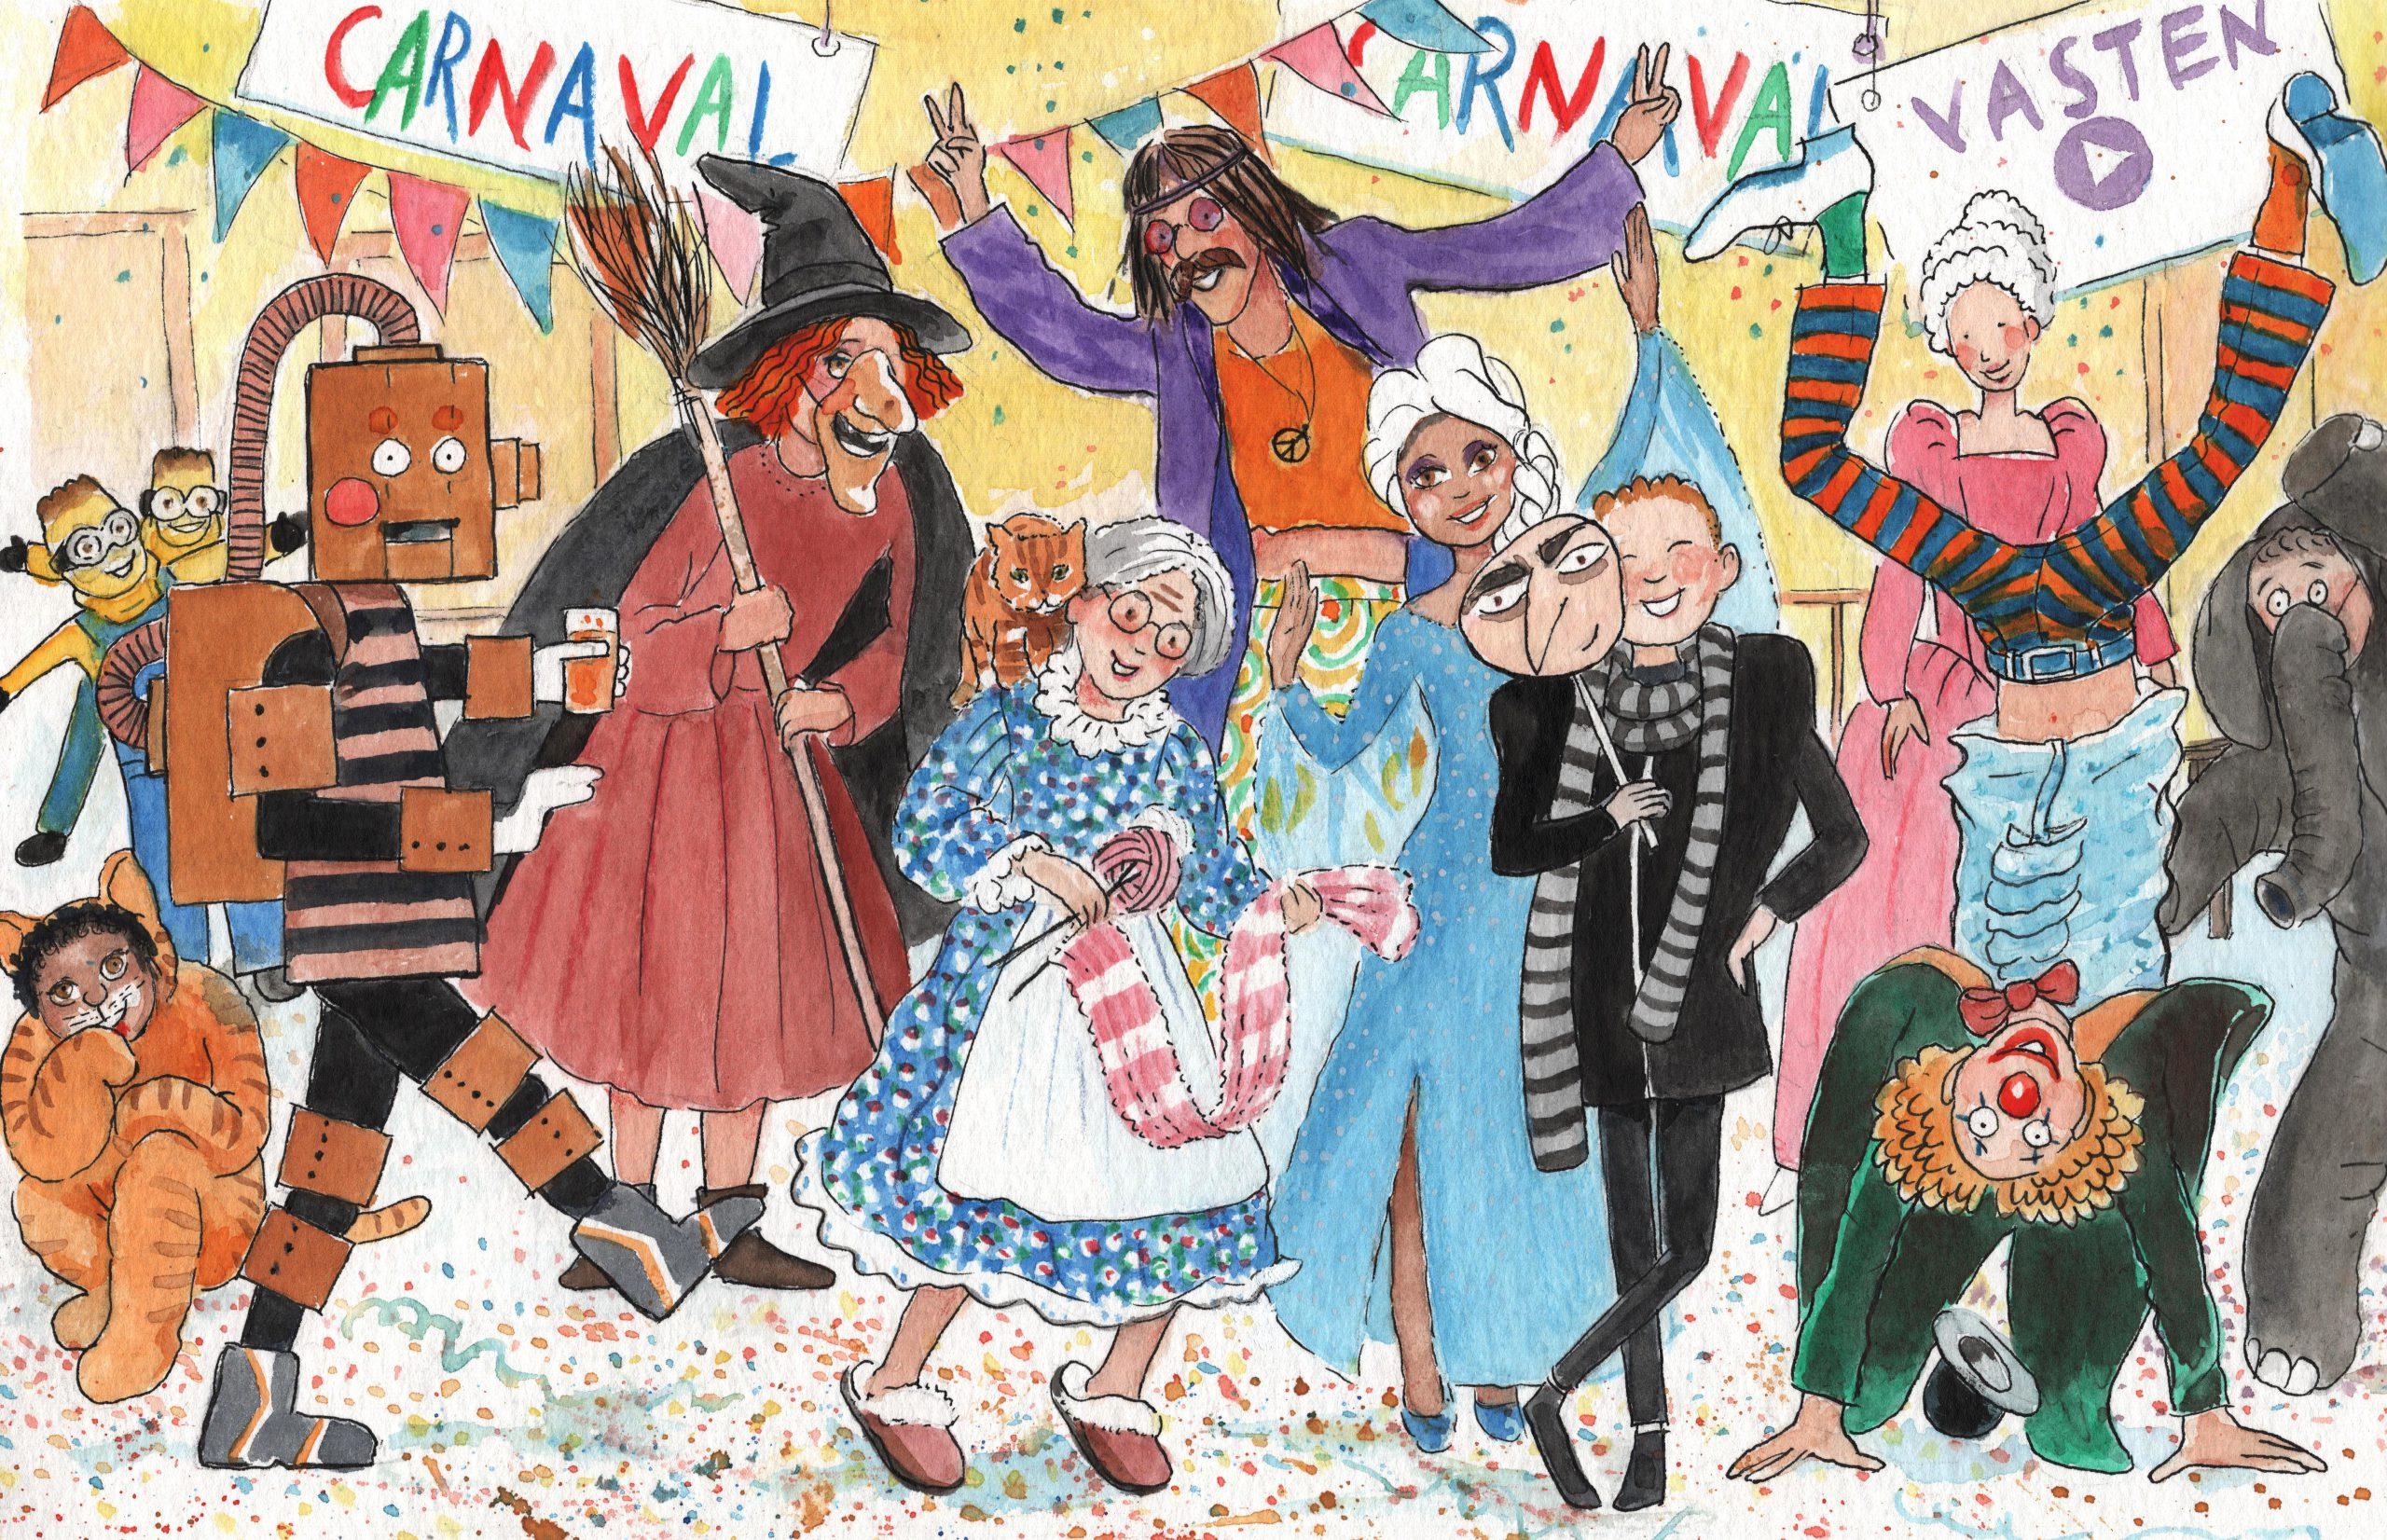 A.3.22 Carnaval en Vasten